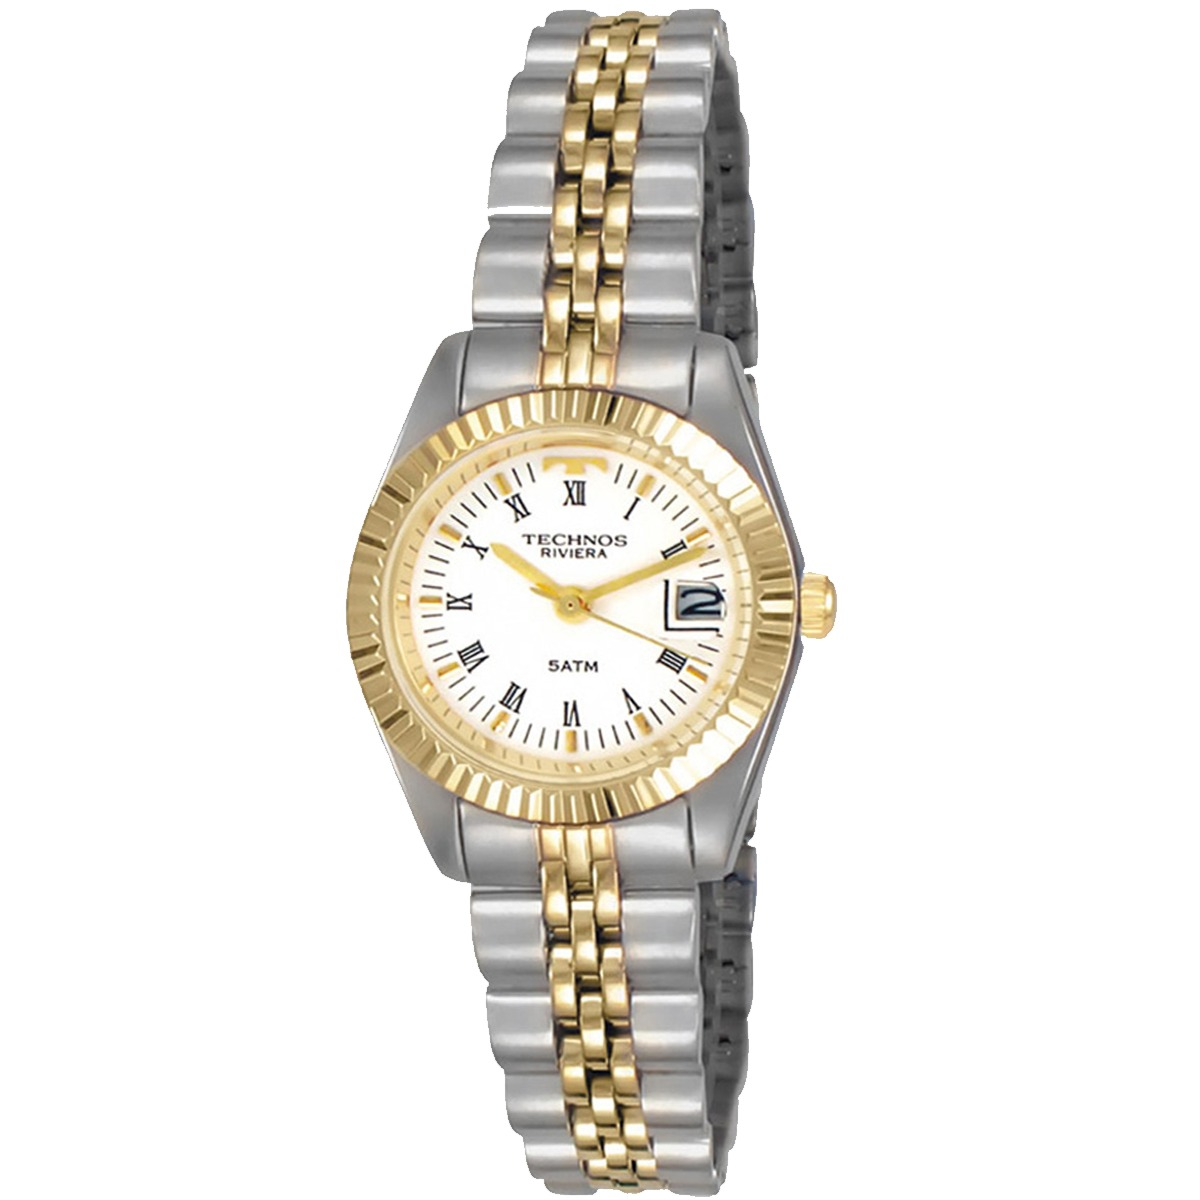 Relógio Technos Feminino Riviera 1l12rxtdy 1b - R  399,00 em Mercado Livre 05586207bc